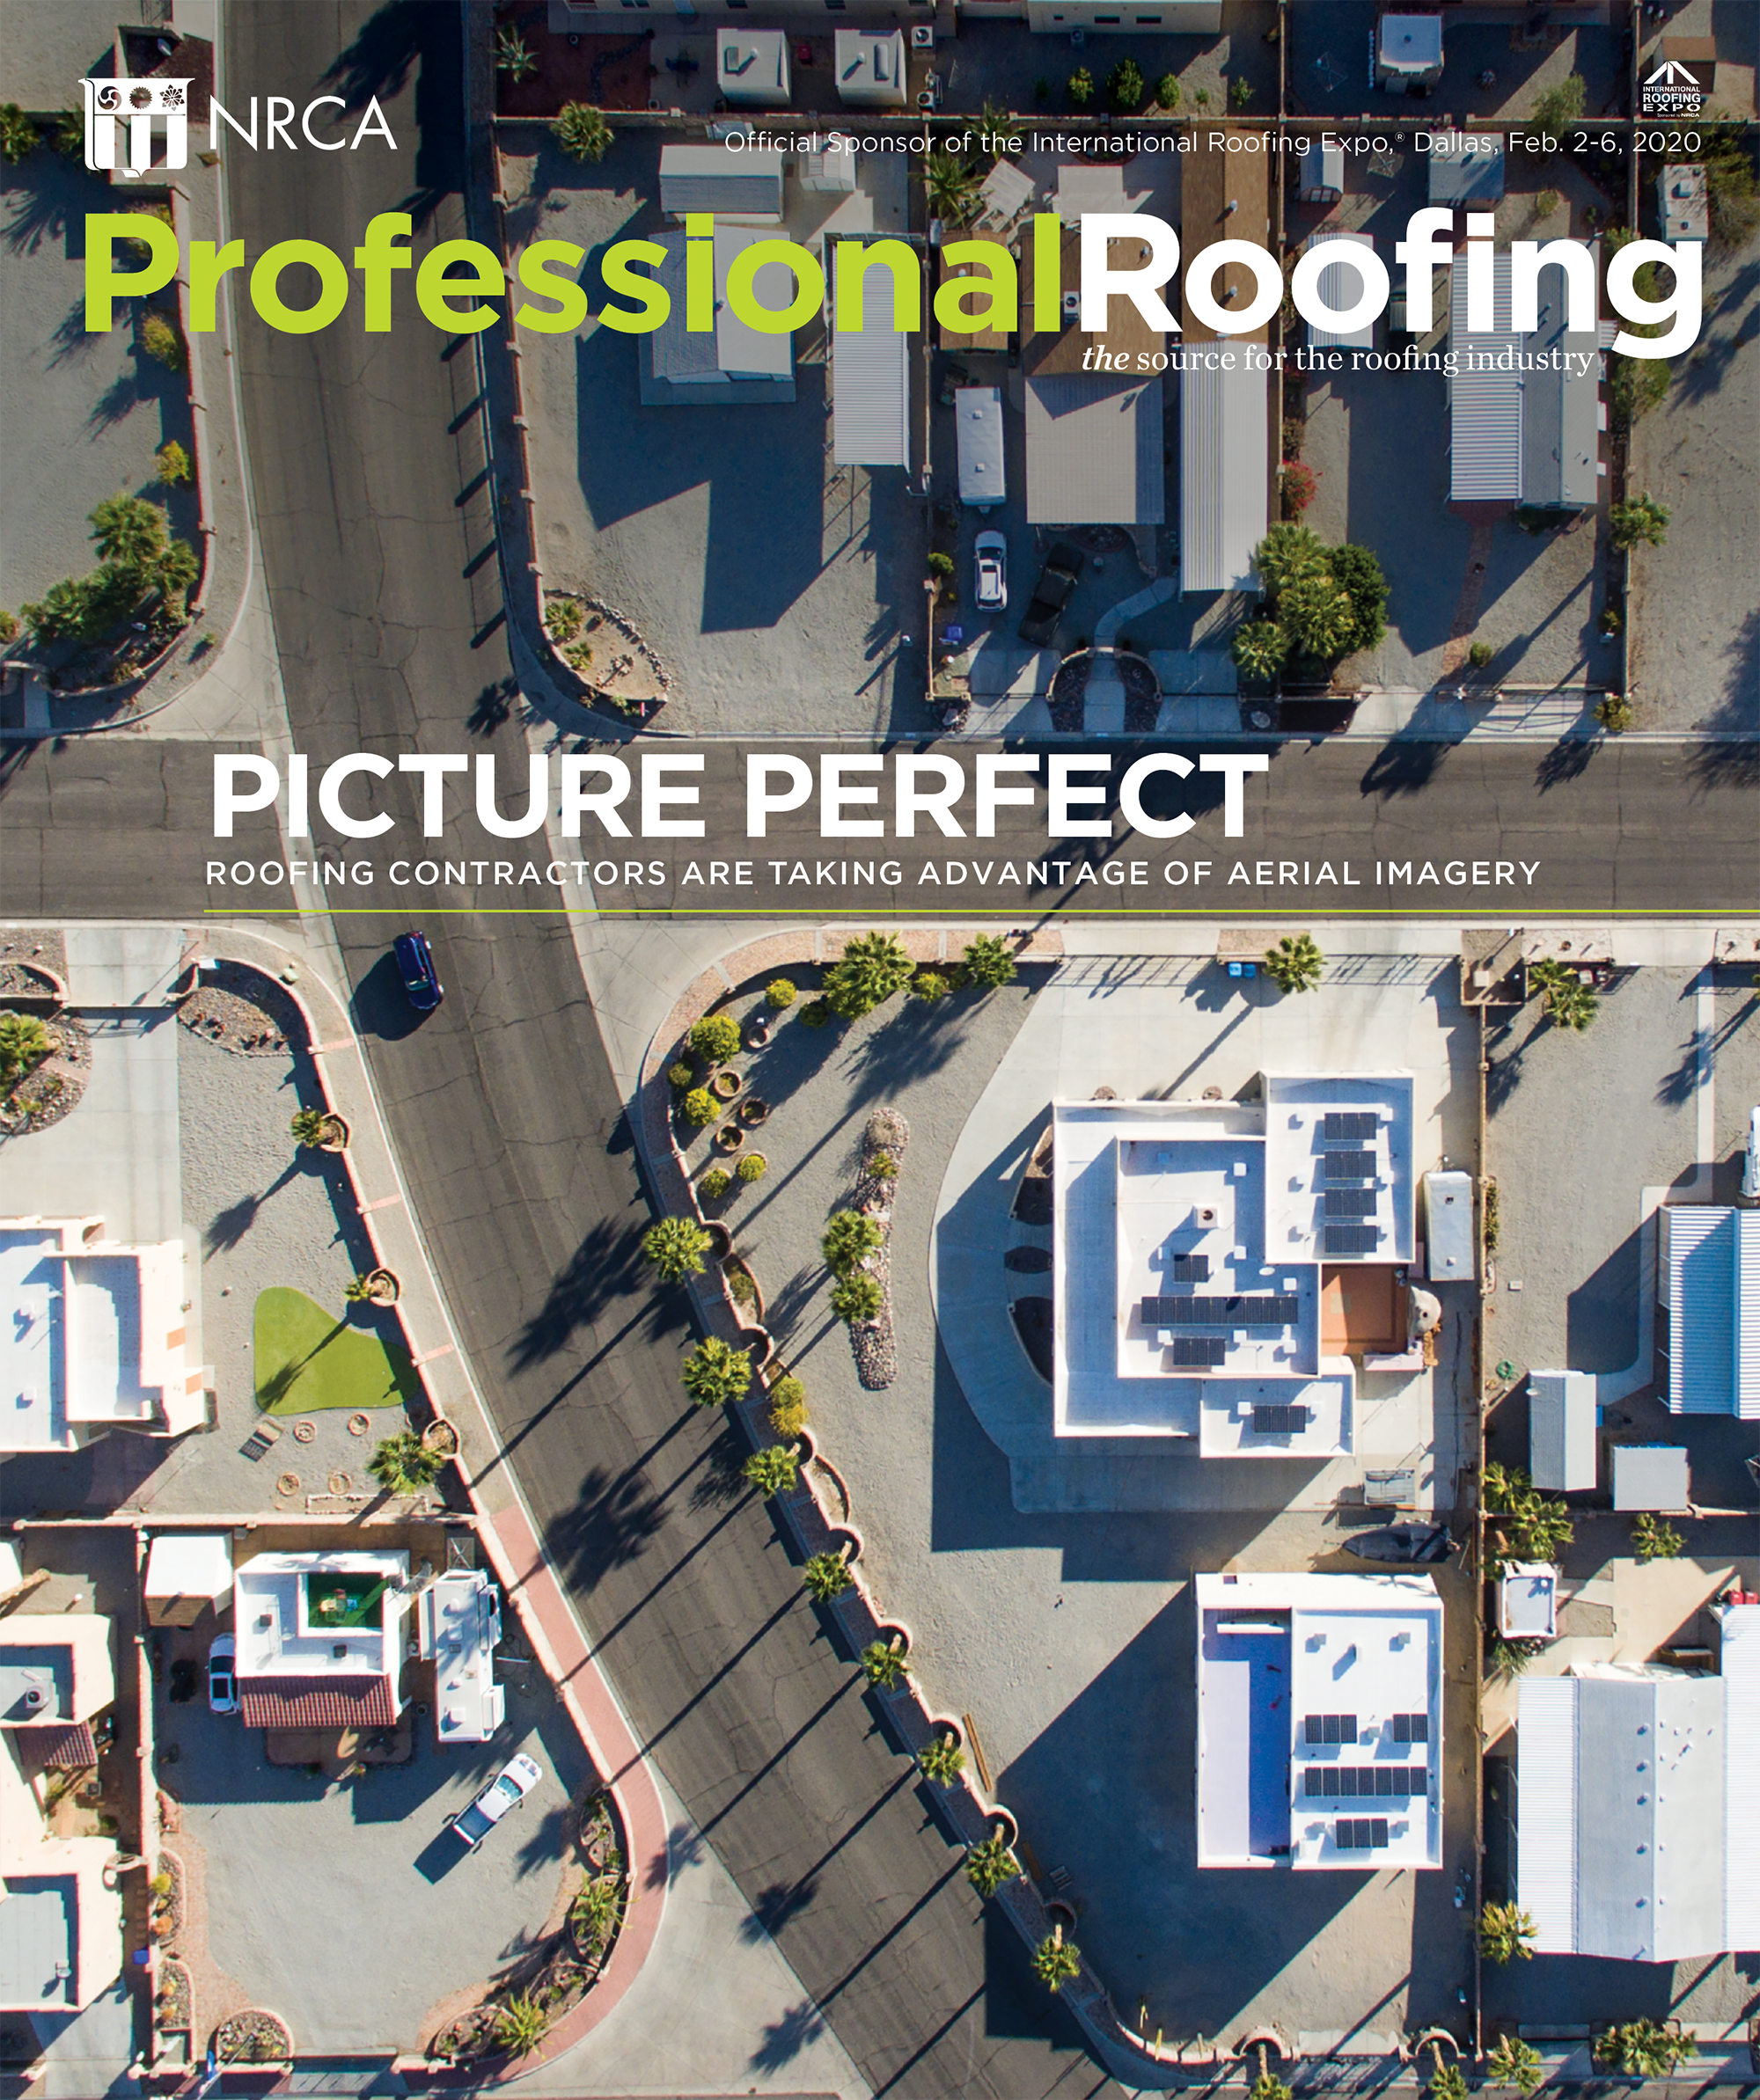 Professional Roofing Magazine 12/1/2019